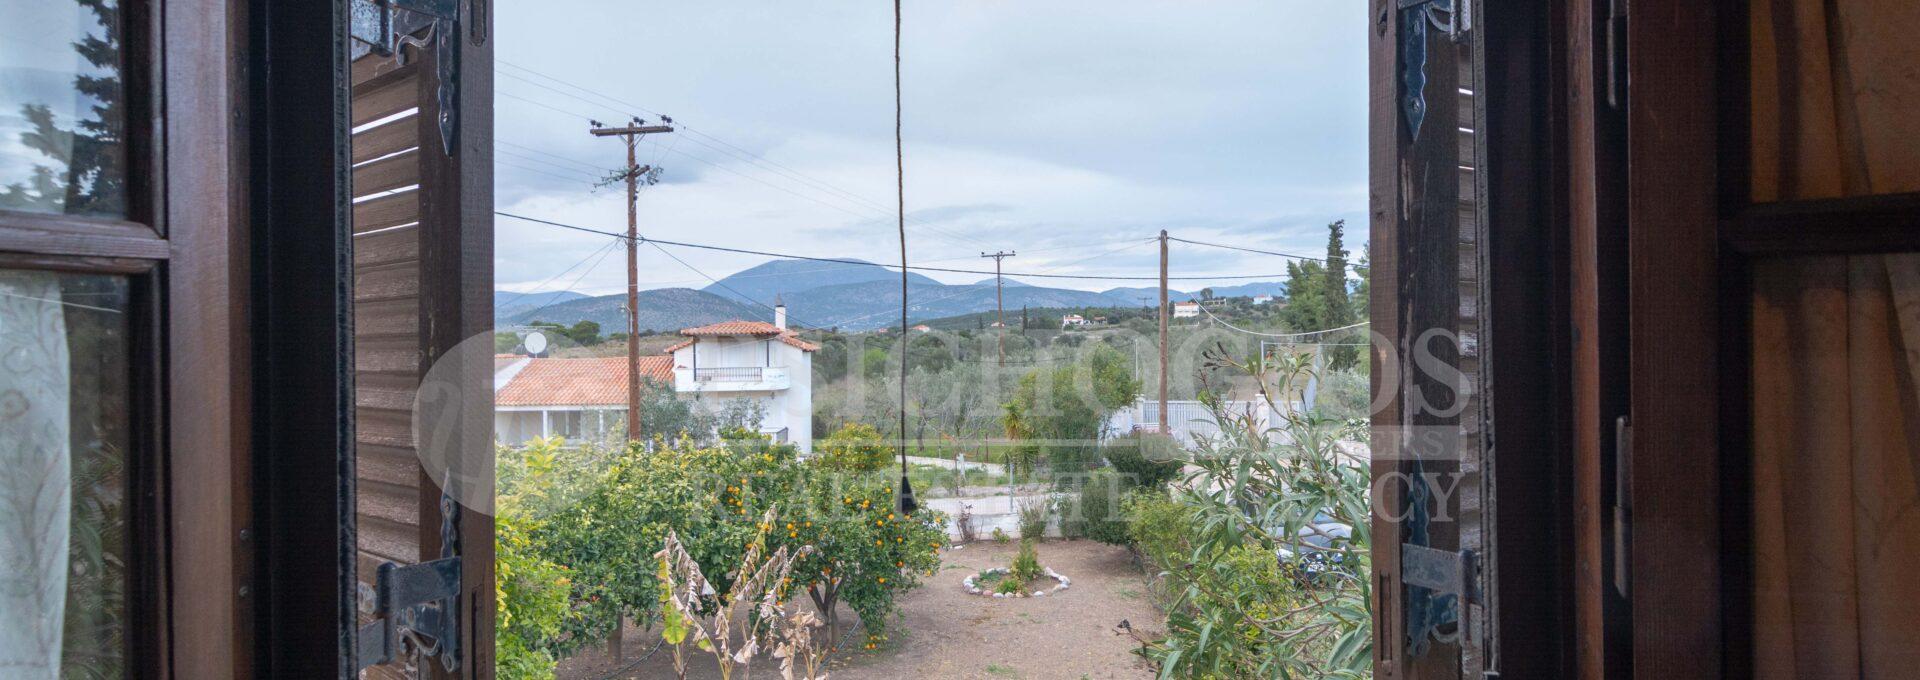 for_sale_two_houses_plot_2000_sq.m._view_ermioni_greece 1 (39)